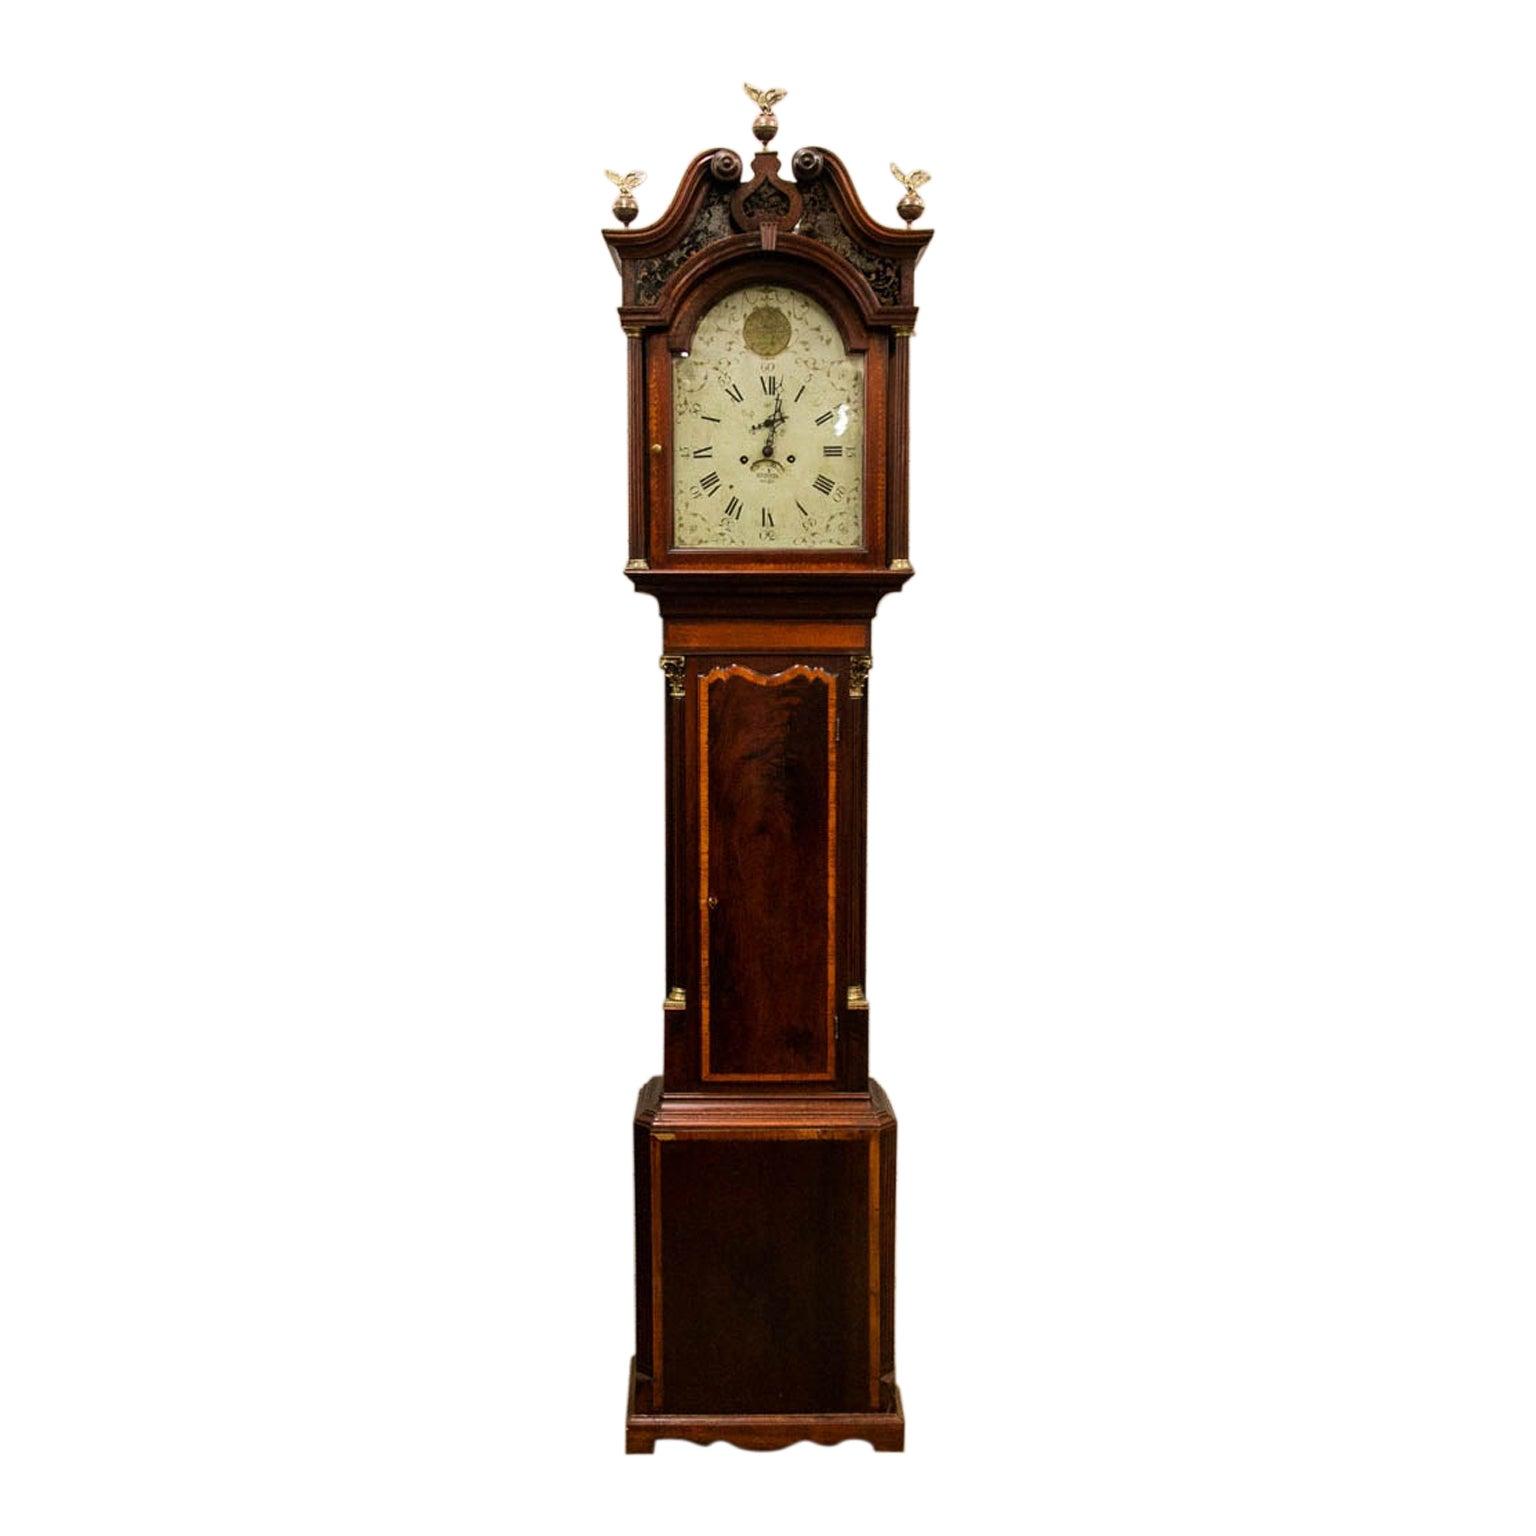 Inlaid Wellington Grandfather Clock